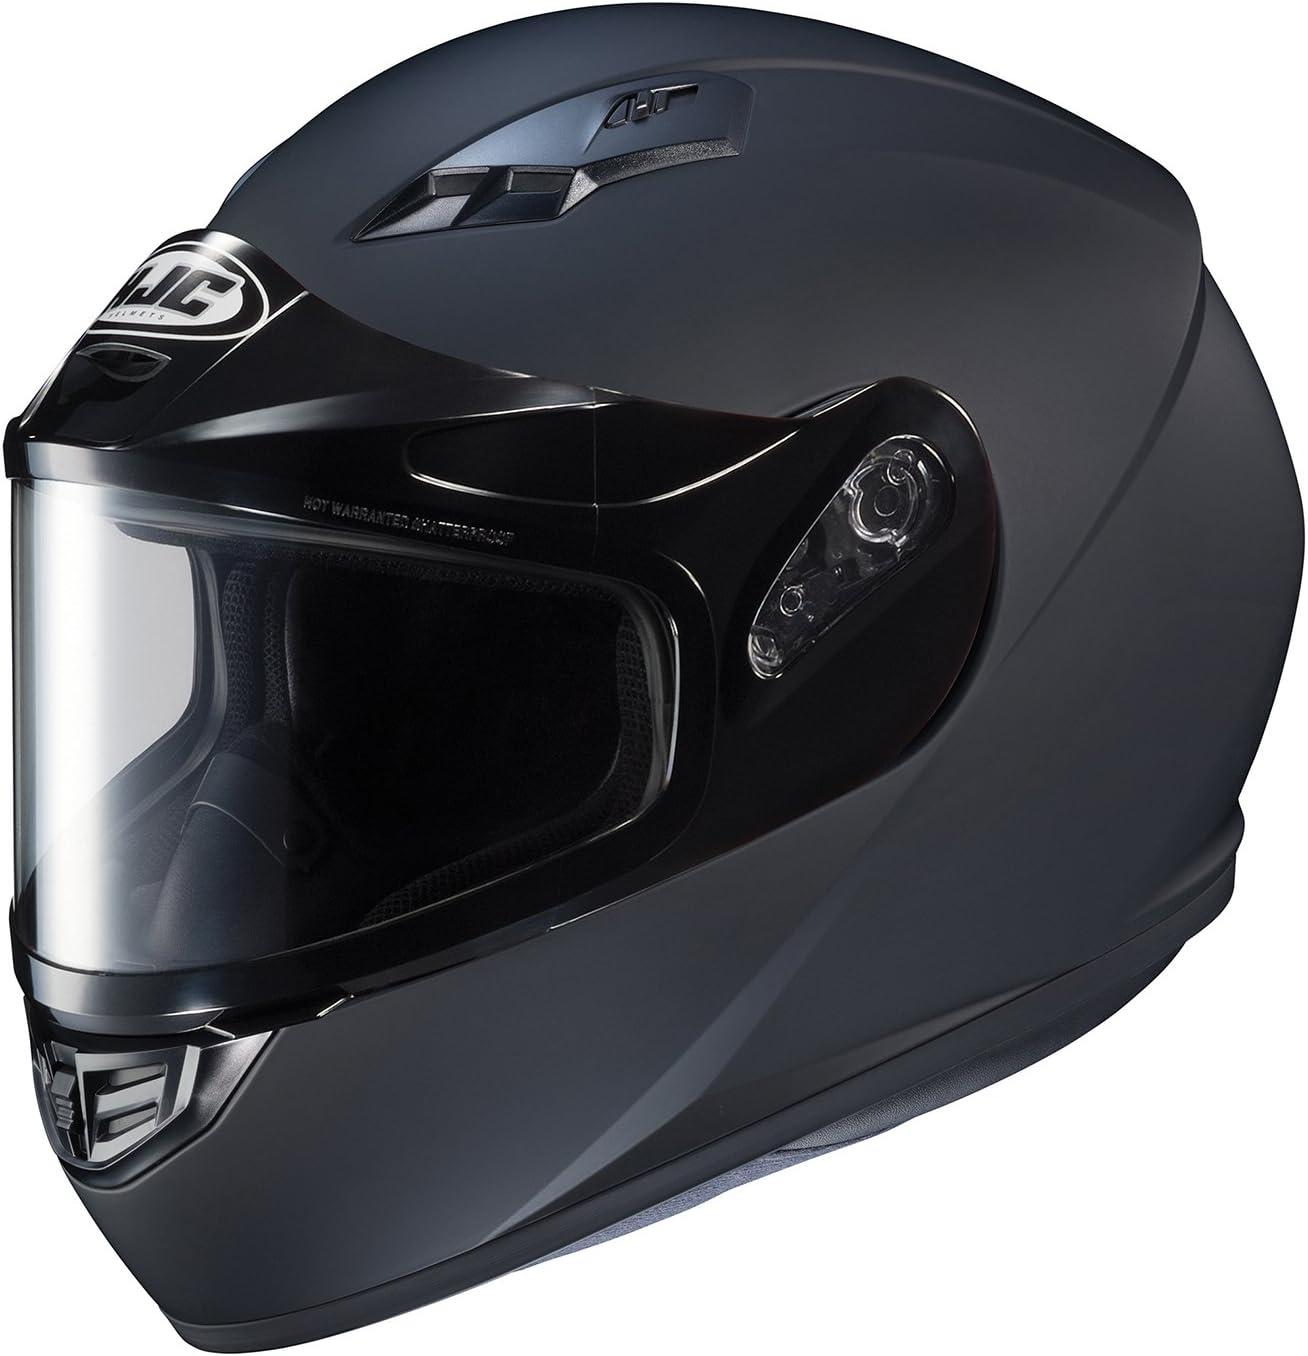 HJC Helmets Unisex-Adult Full Face Snow Helmet with Framed Dual Lens Shield